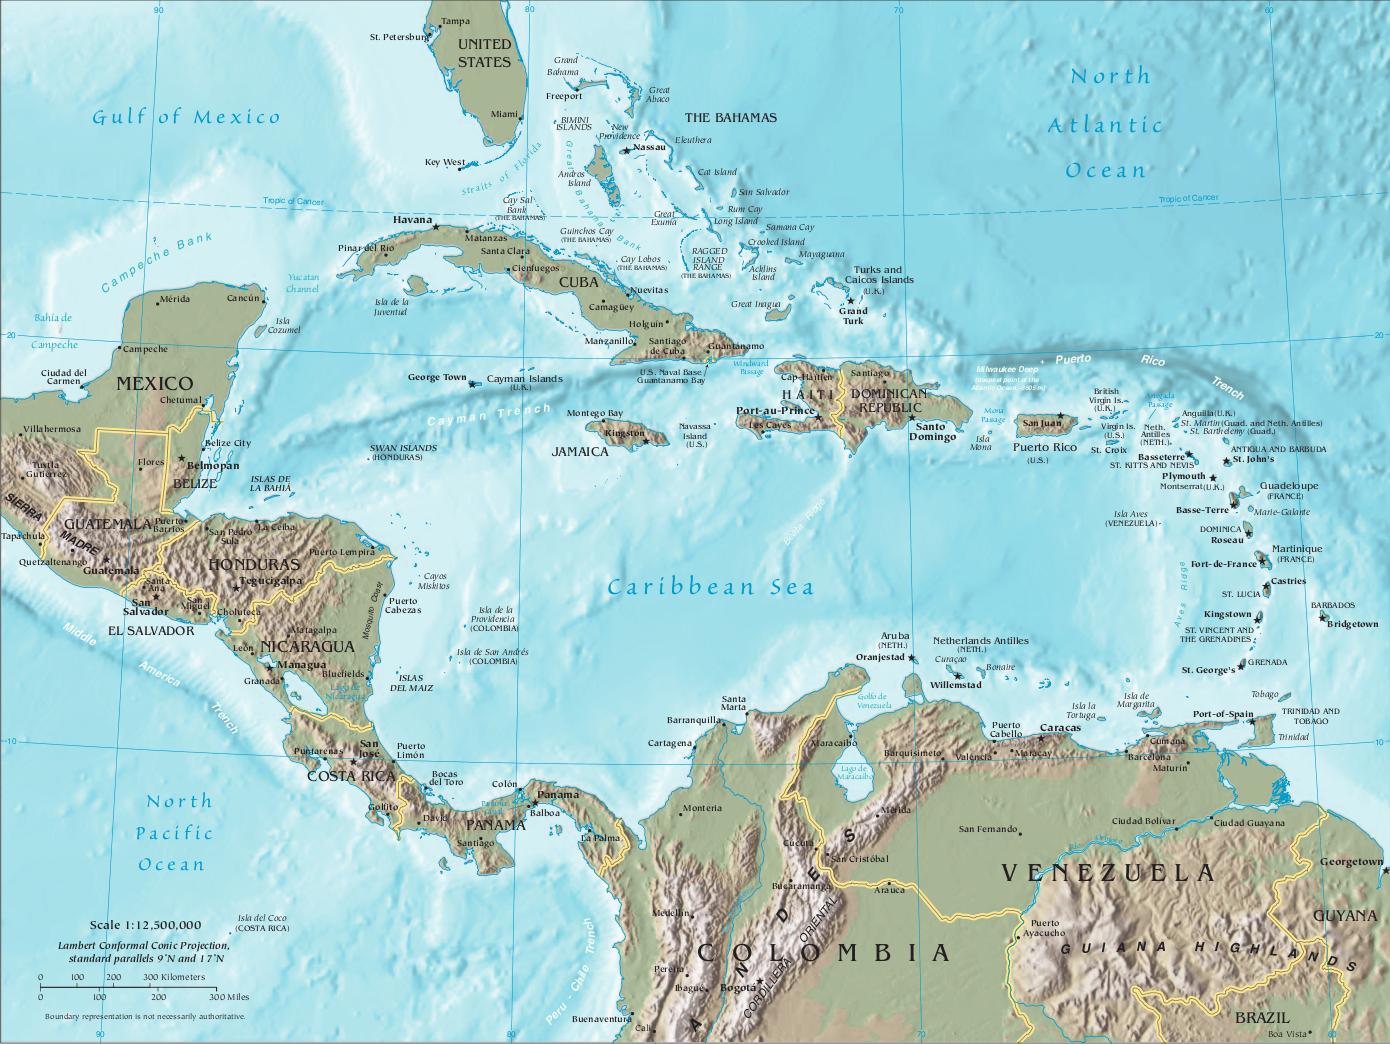 Karibik Karte Welt.Karte Der Karibik Und Zentralamerika Reliefkarte Weltkarte Com